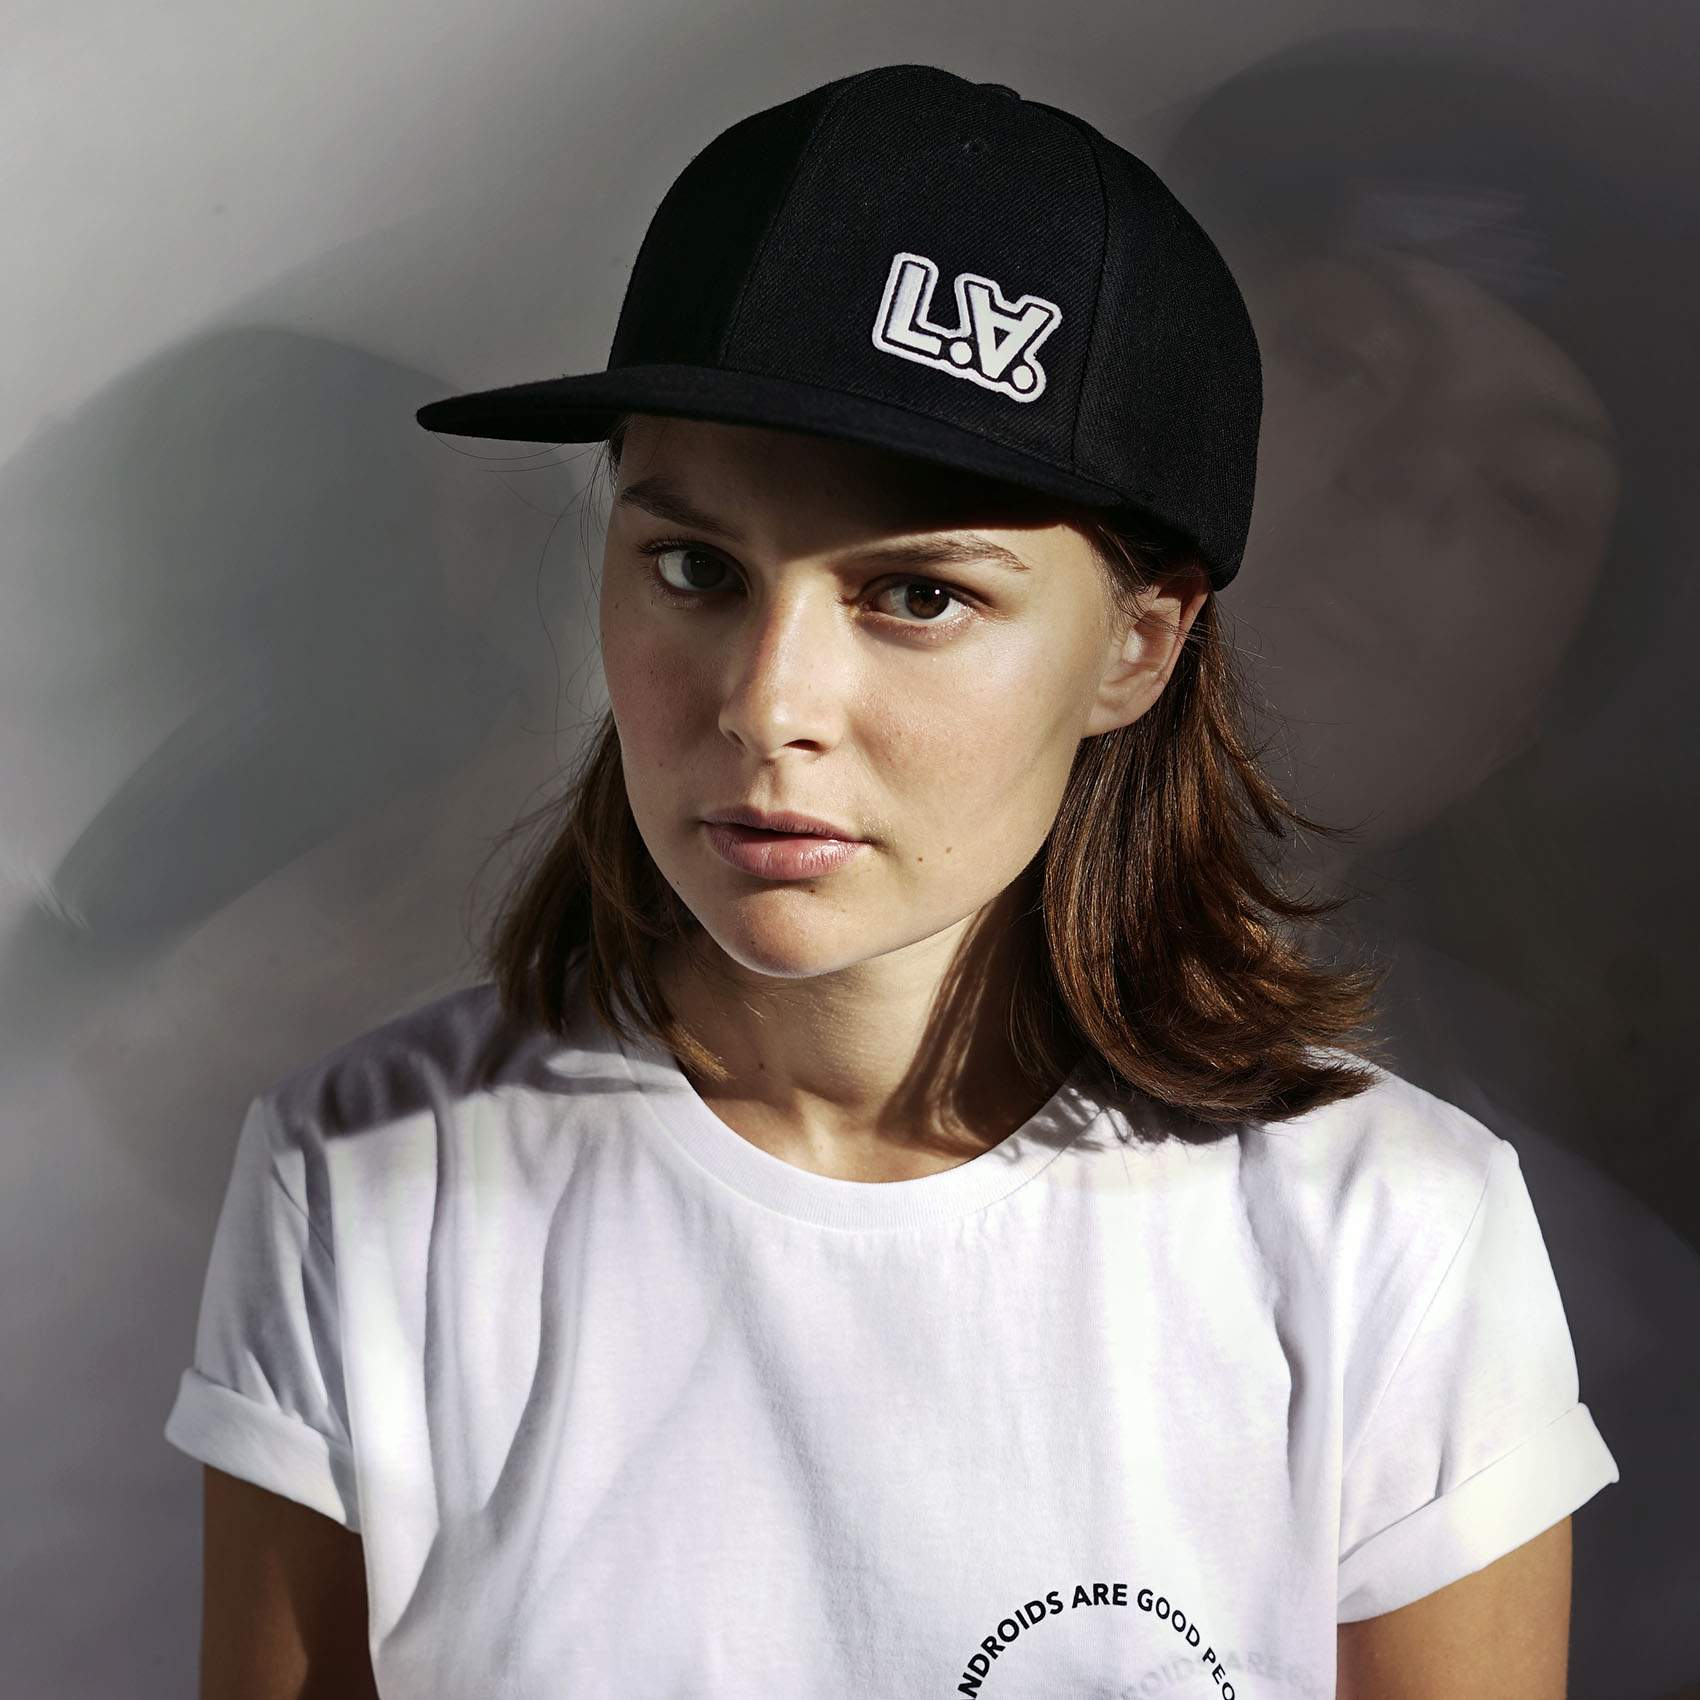 sd_la-girl-hat